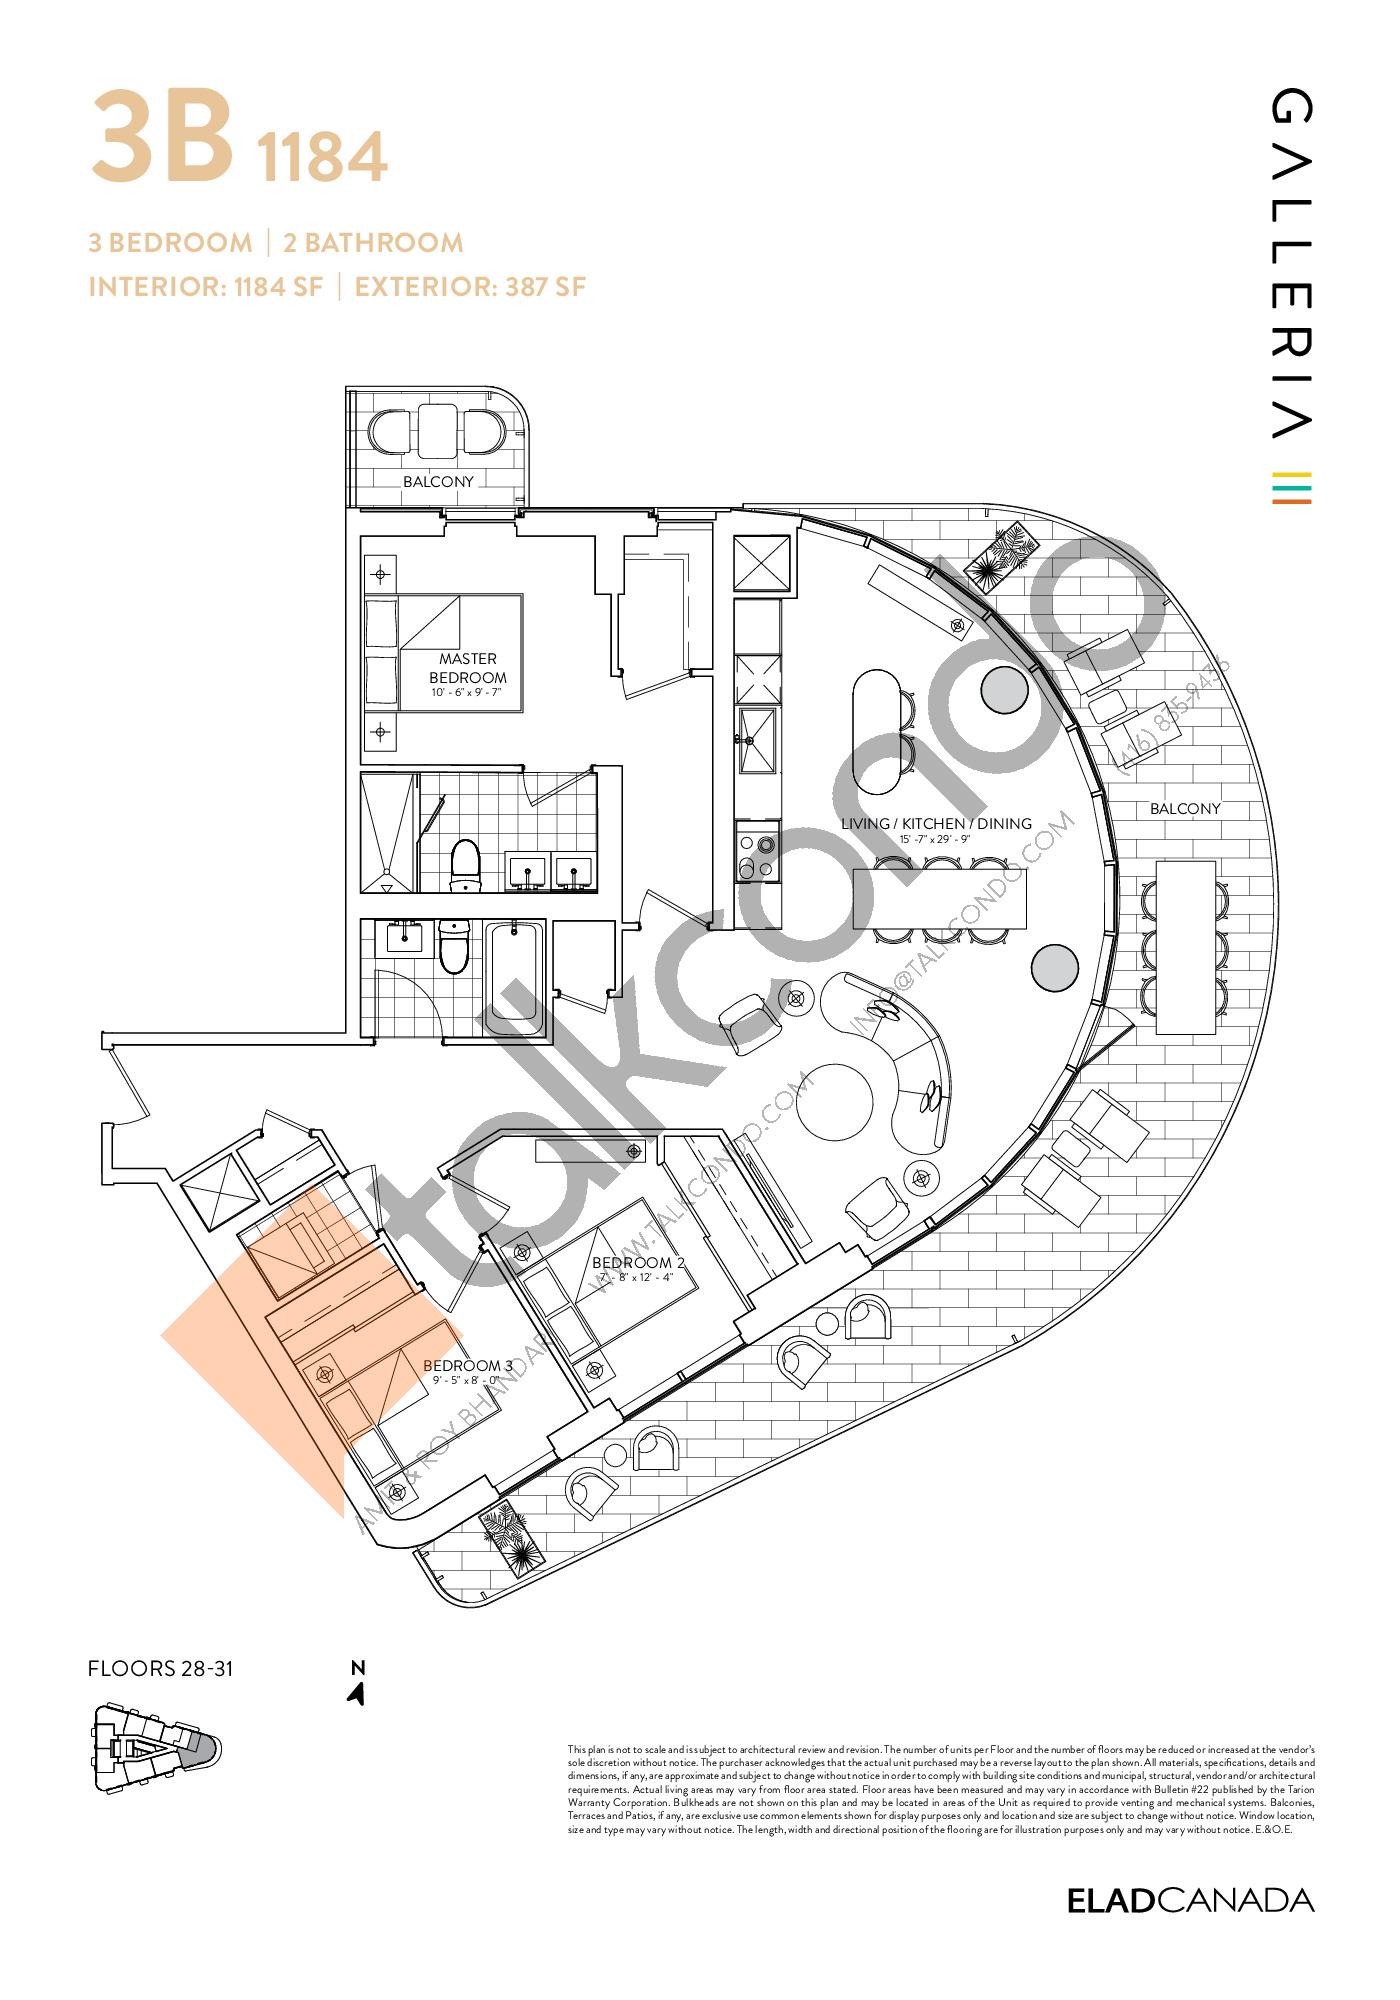 3B 1184 Floor Plan at Galleria 03 Condos - 1184 sq.ft